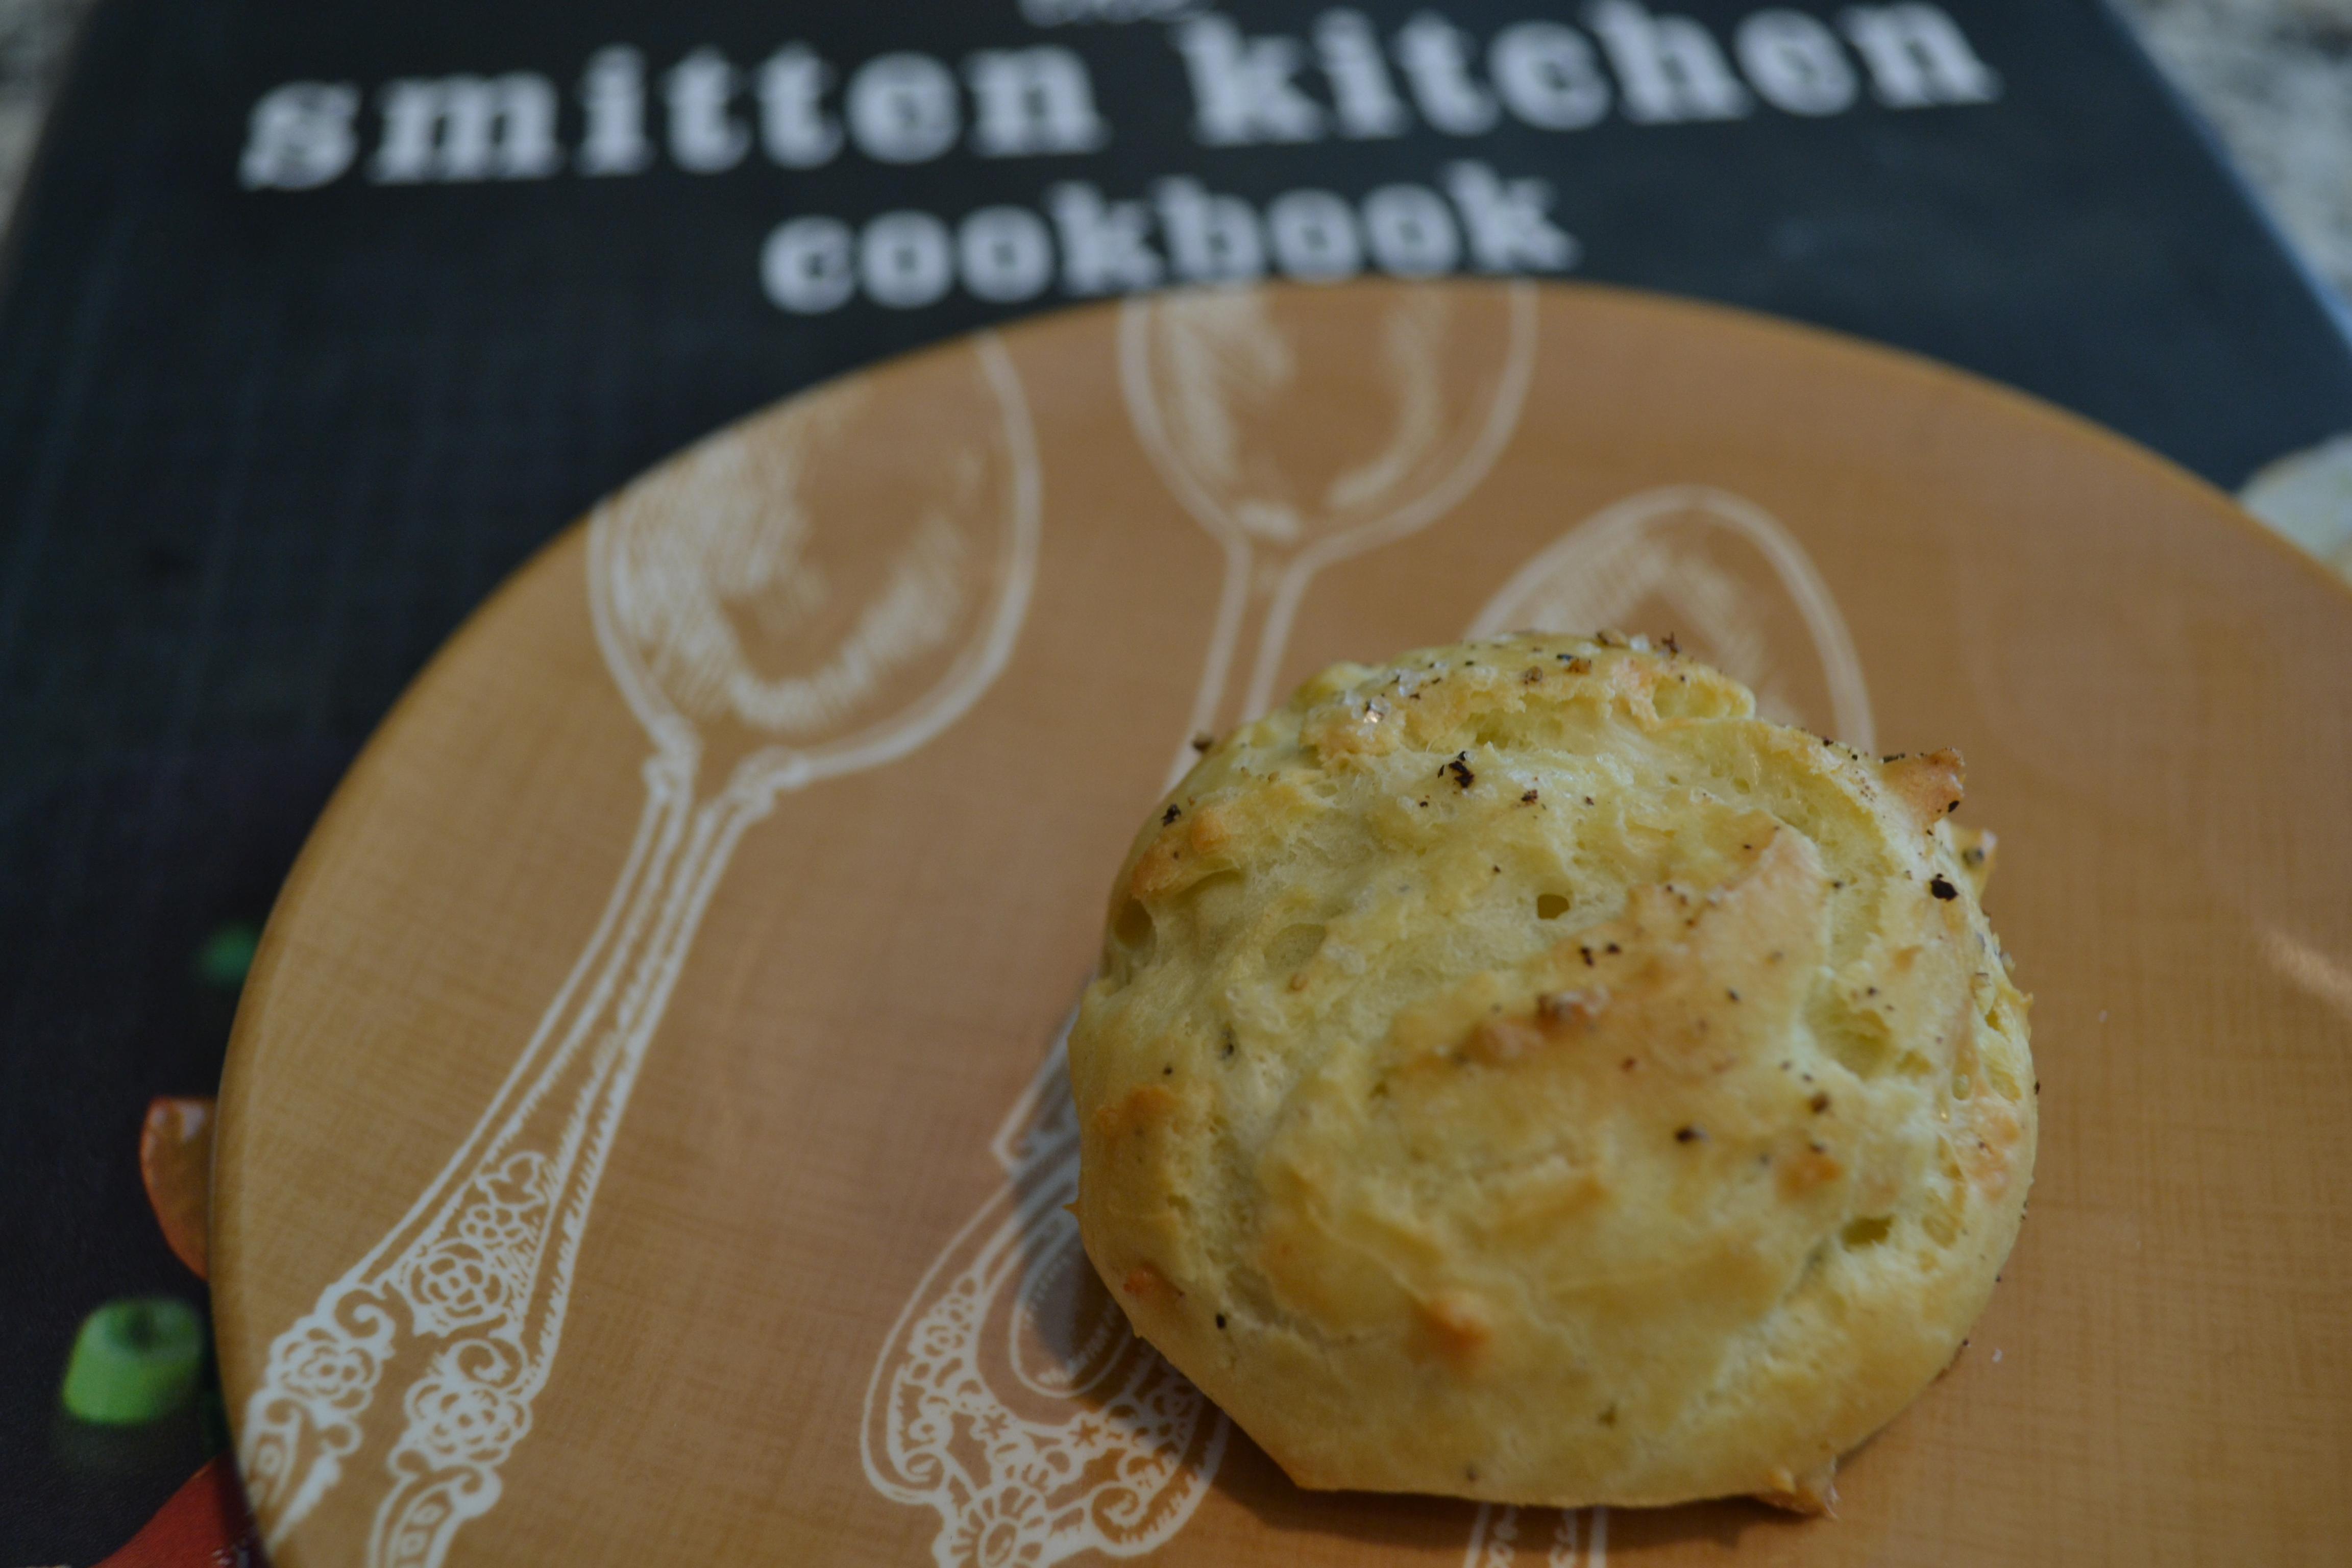 Smitten Kitchen Cookbook black pepper & blue cheese gougeres - little bits of